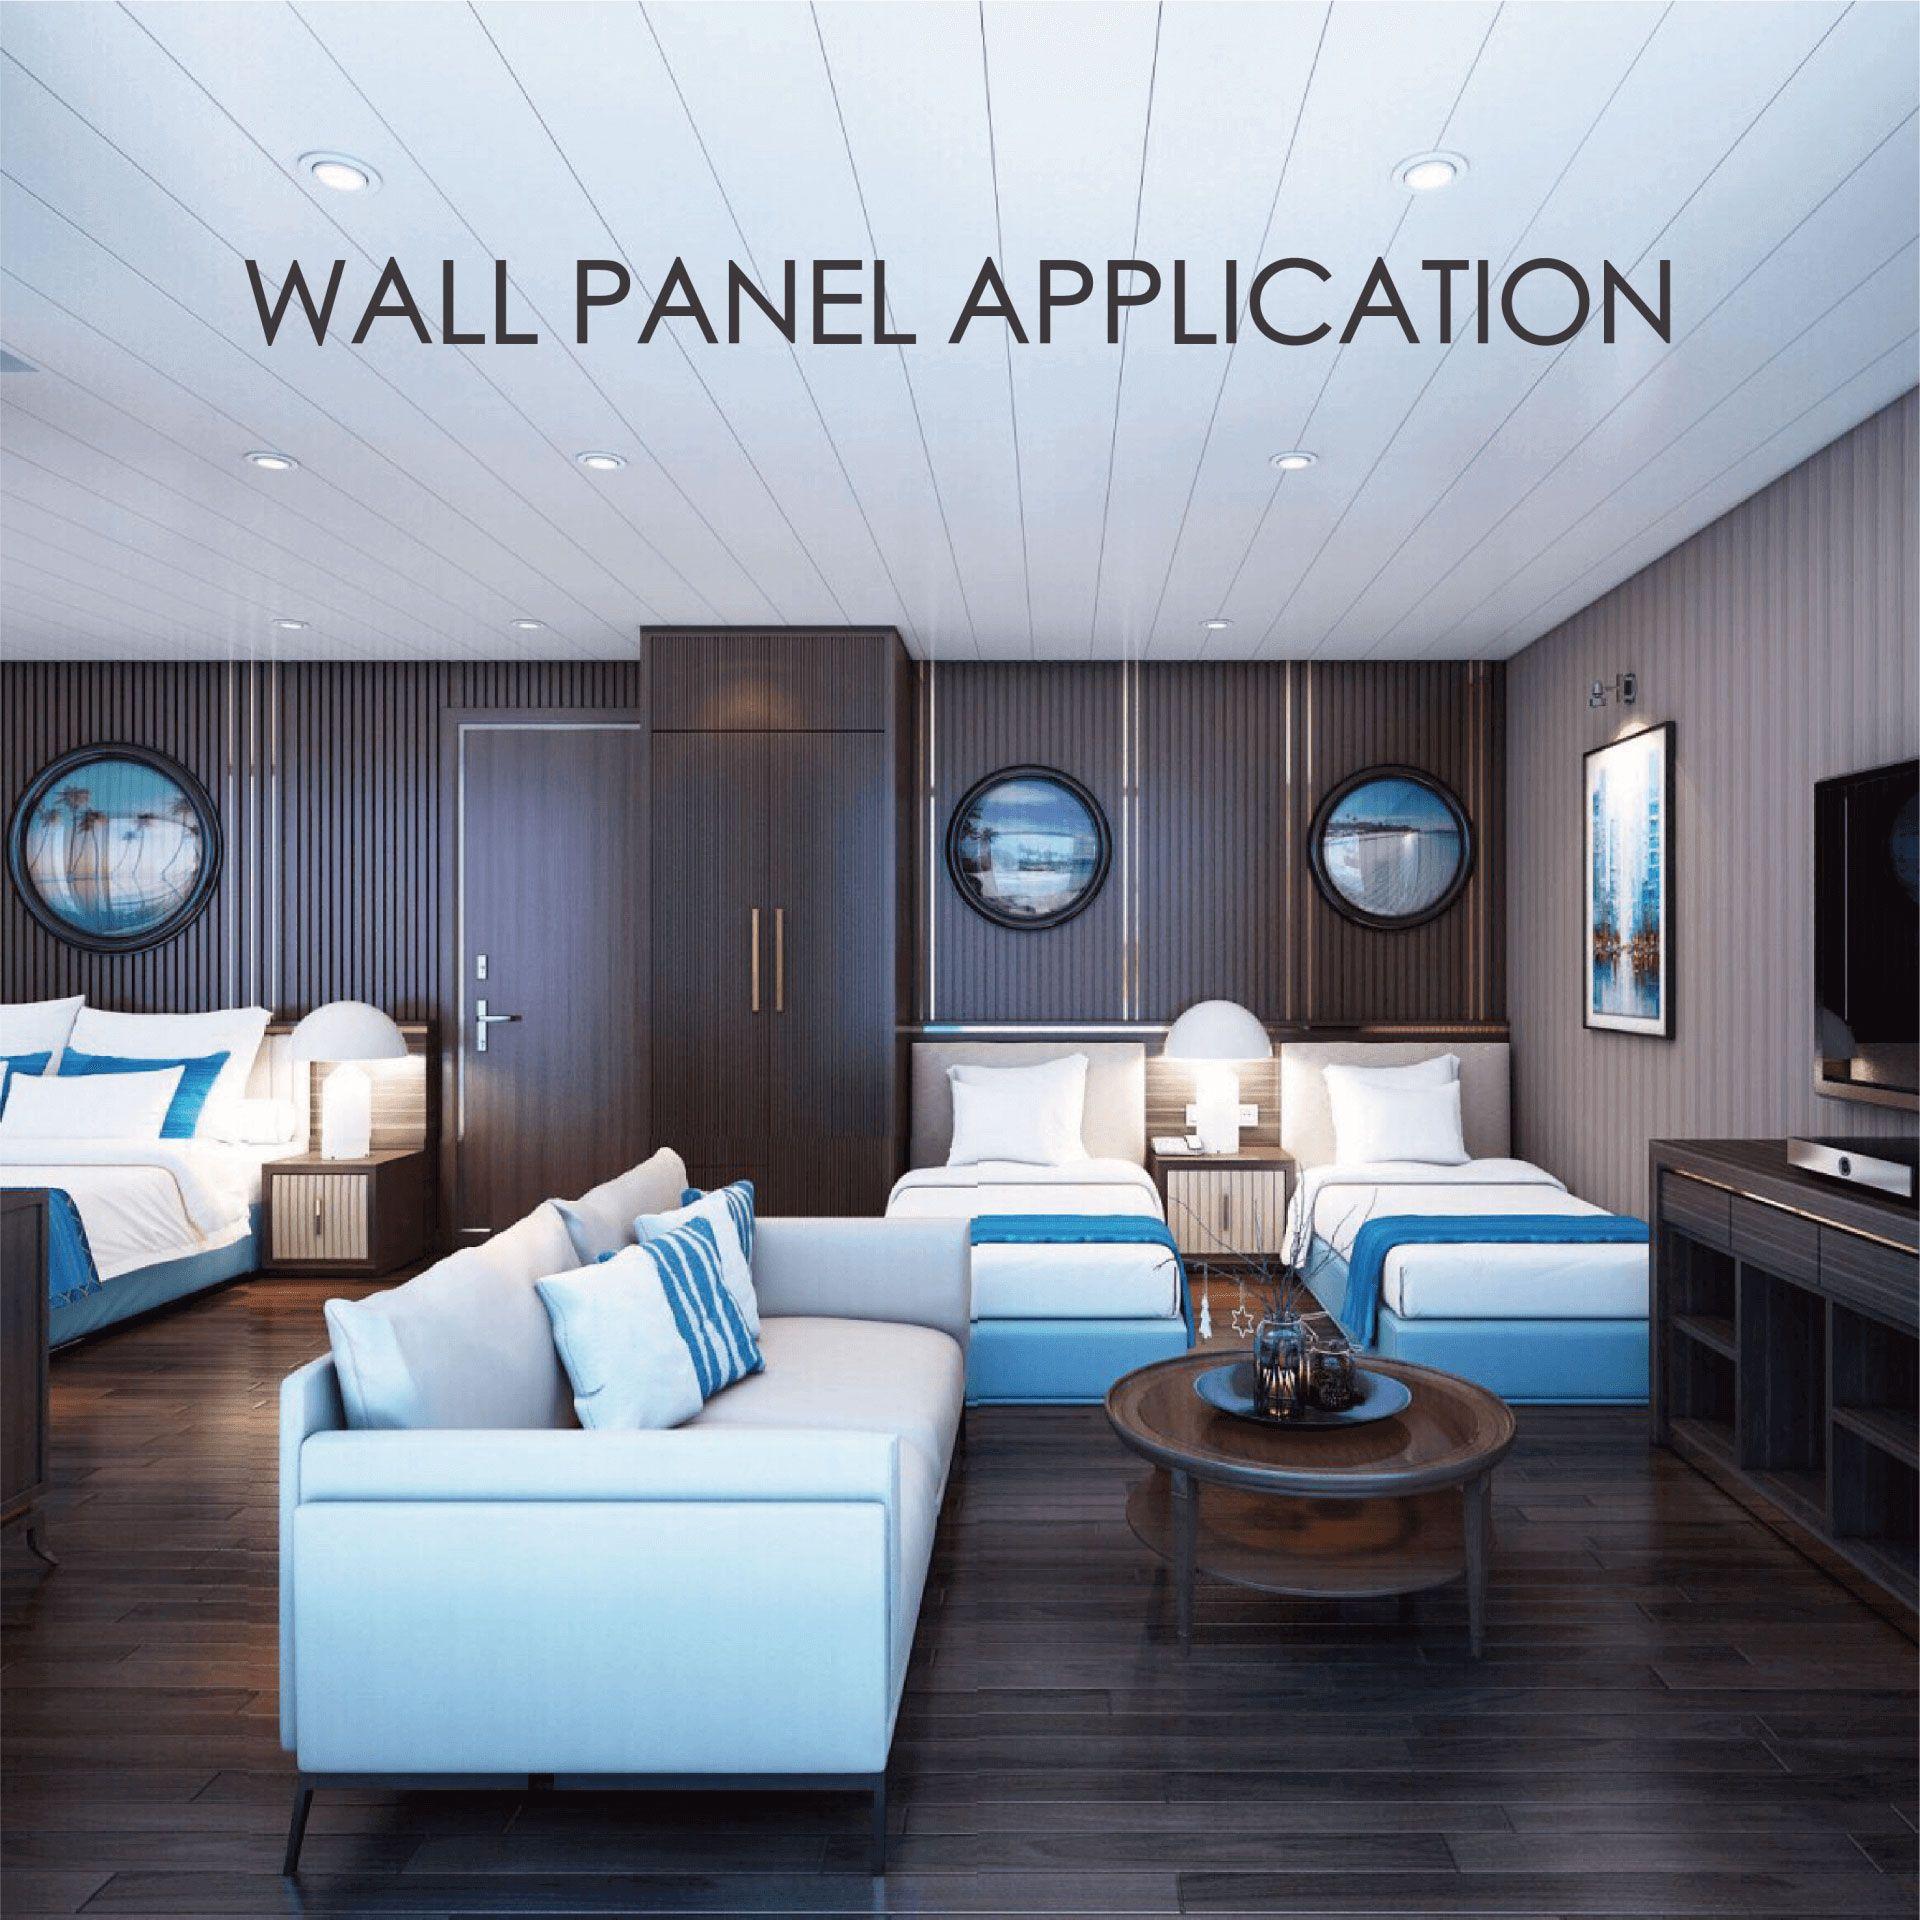 Wall Panel Application